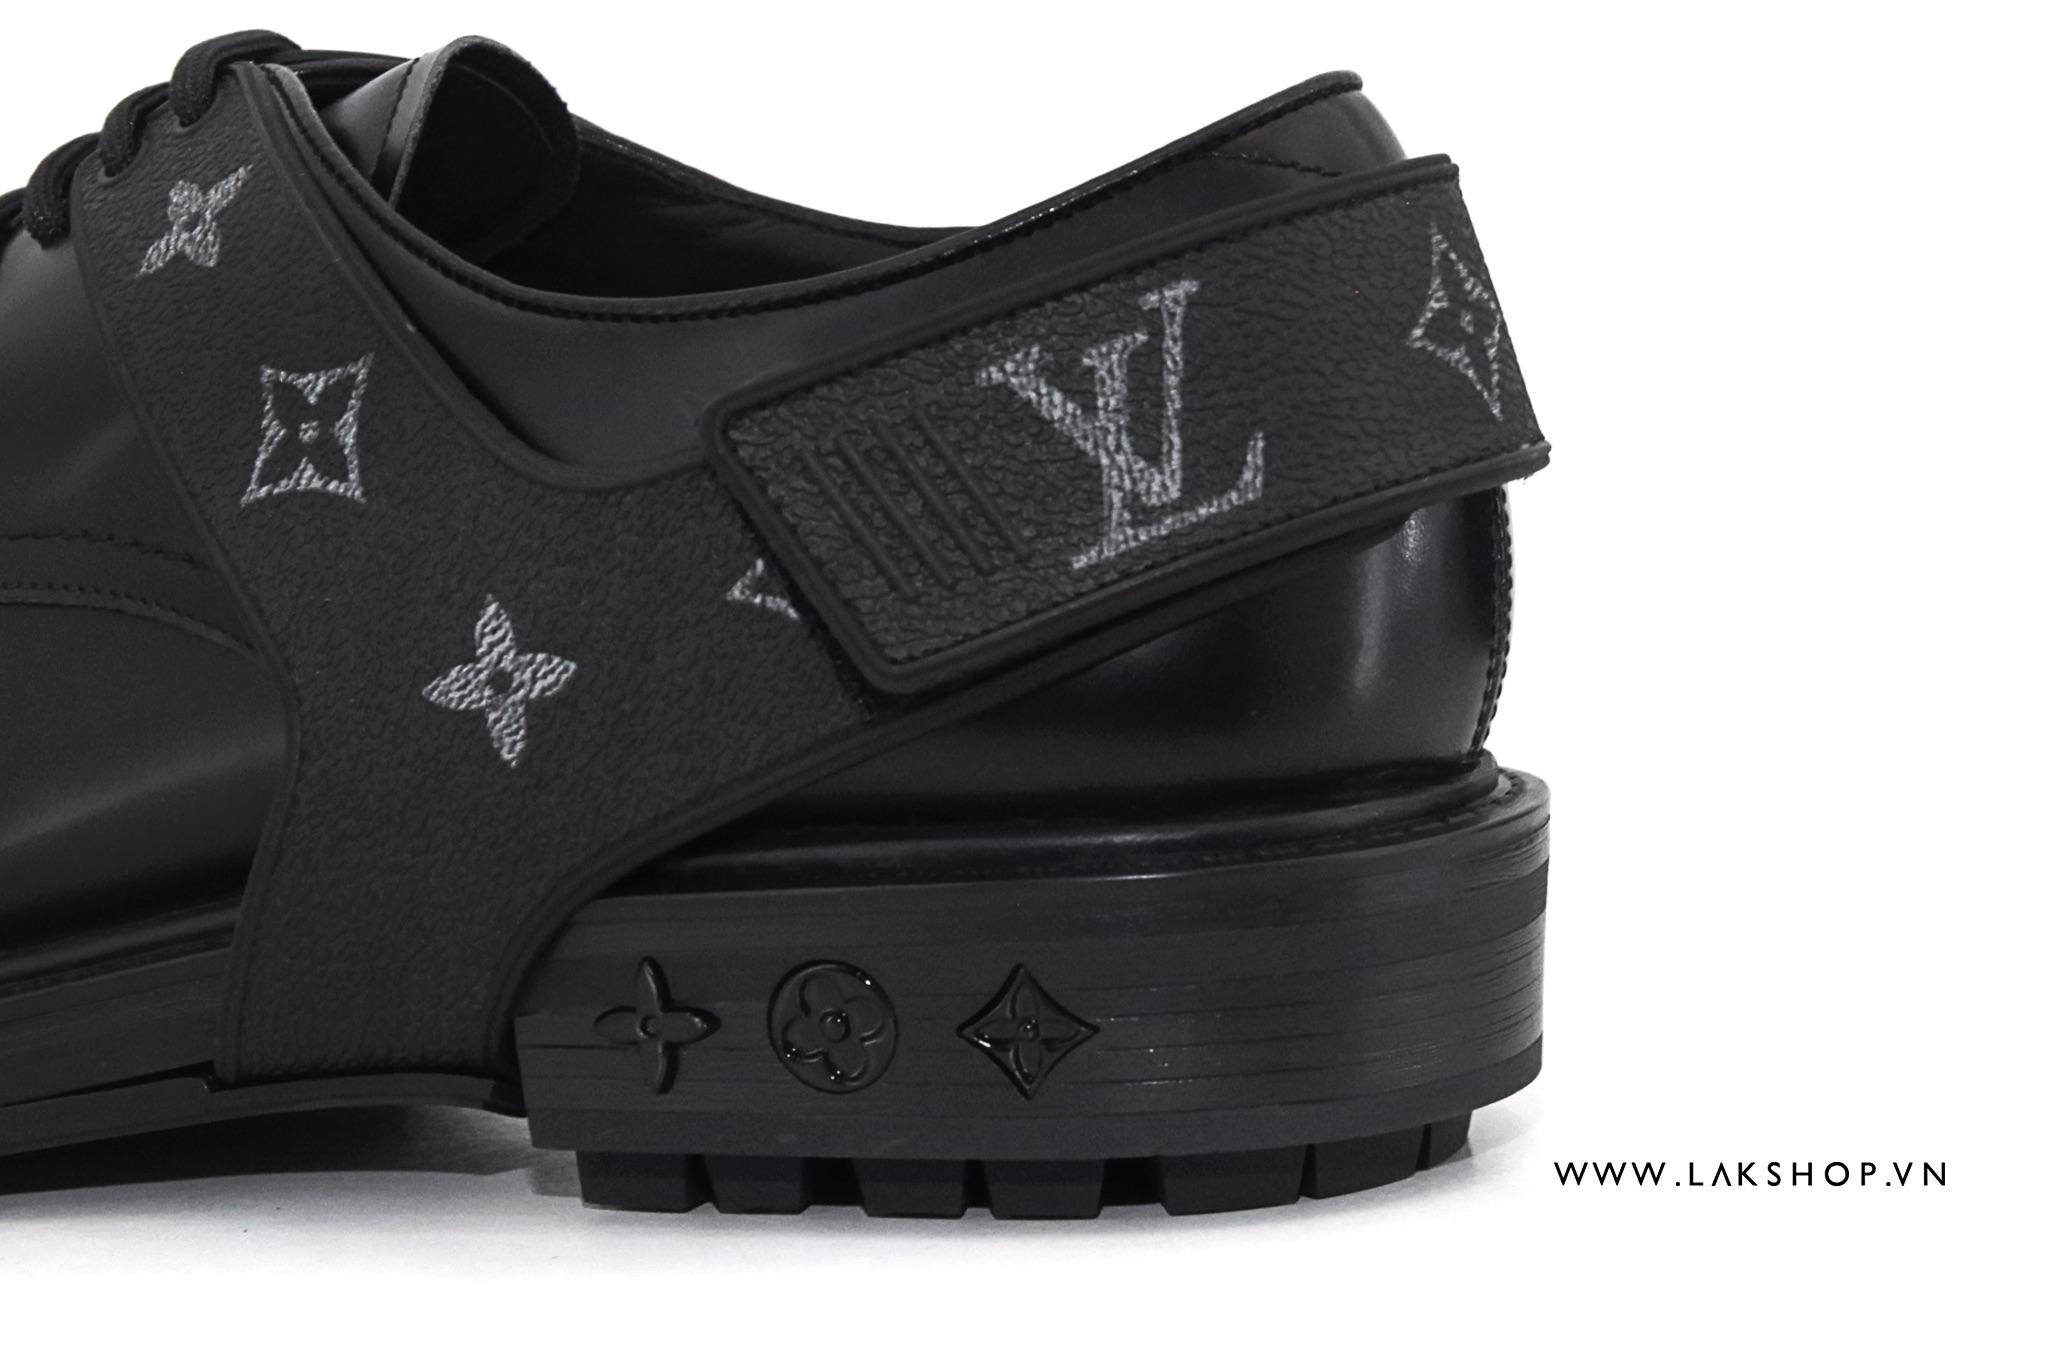 Louis Vuitton LV Derby Harness Derby in Black